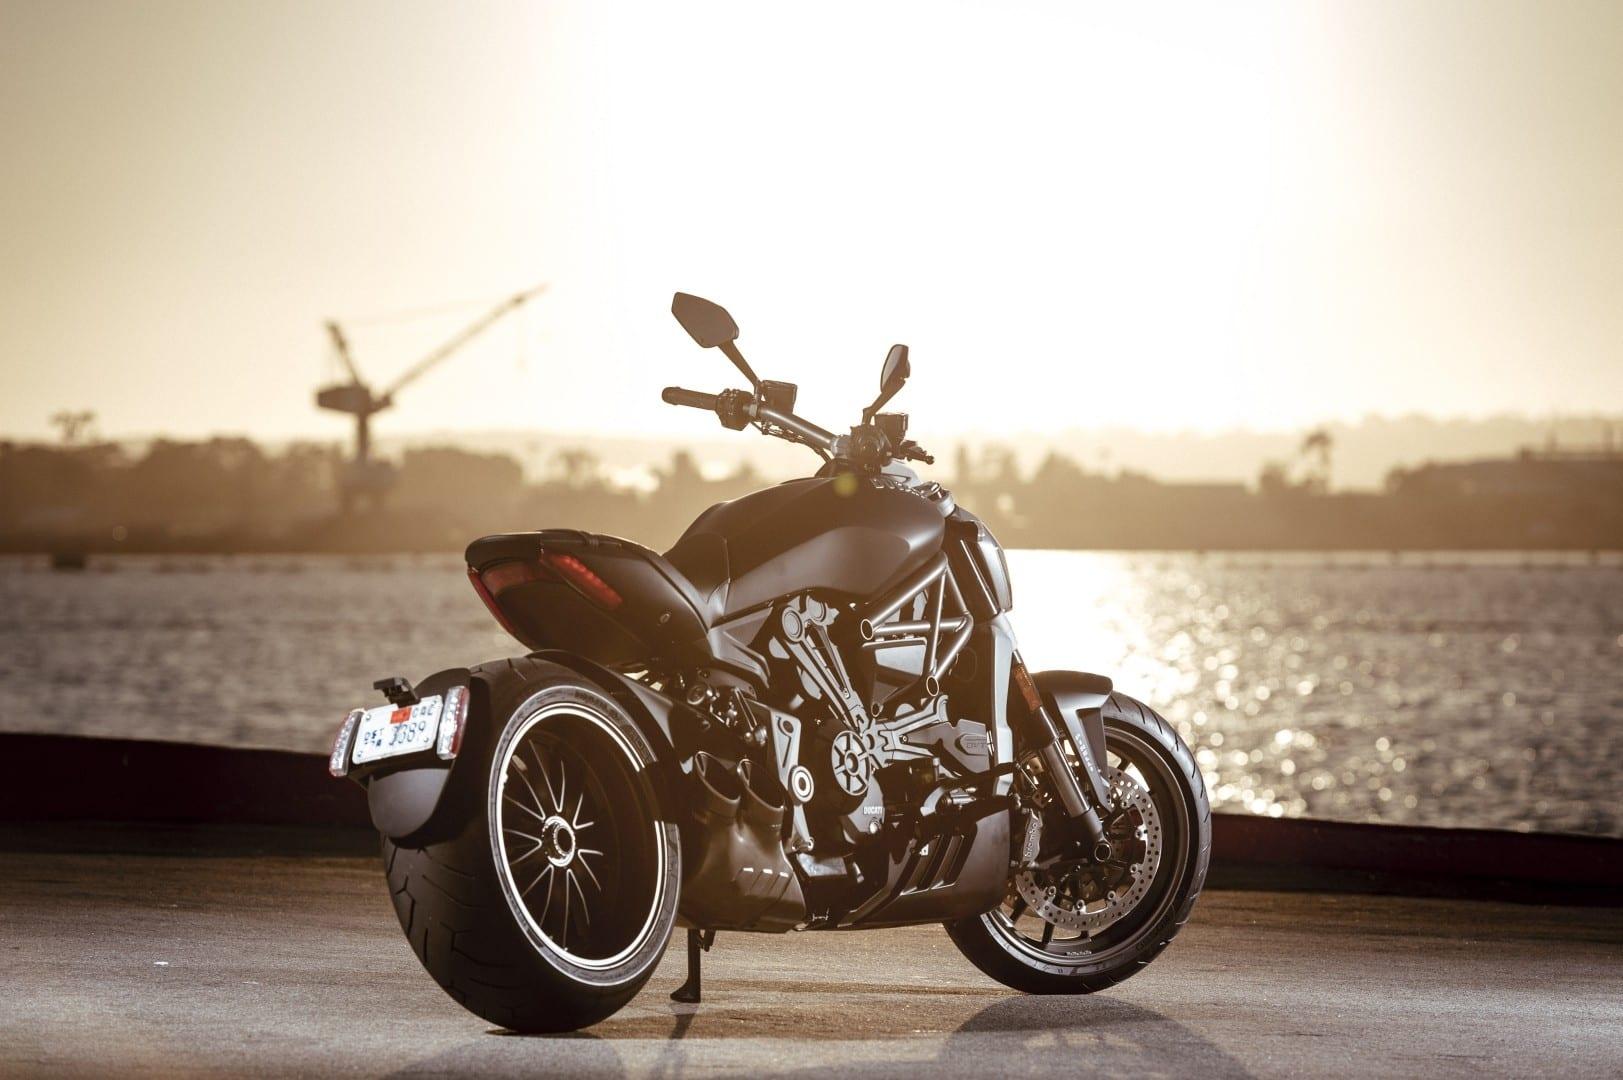 2016 Ducati XDiavel experience tour sturgis